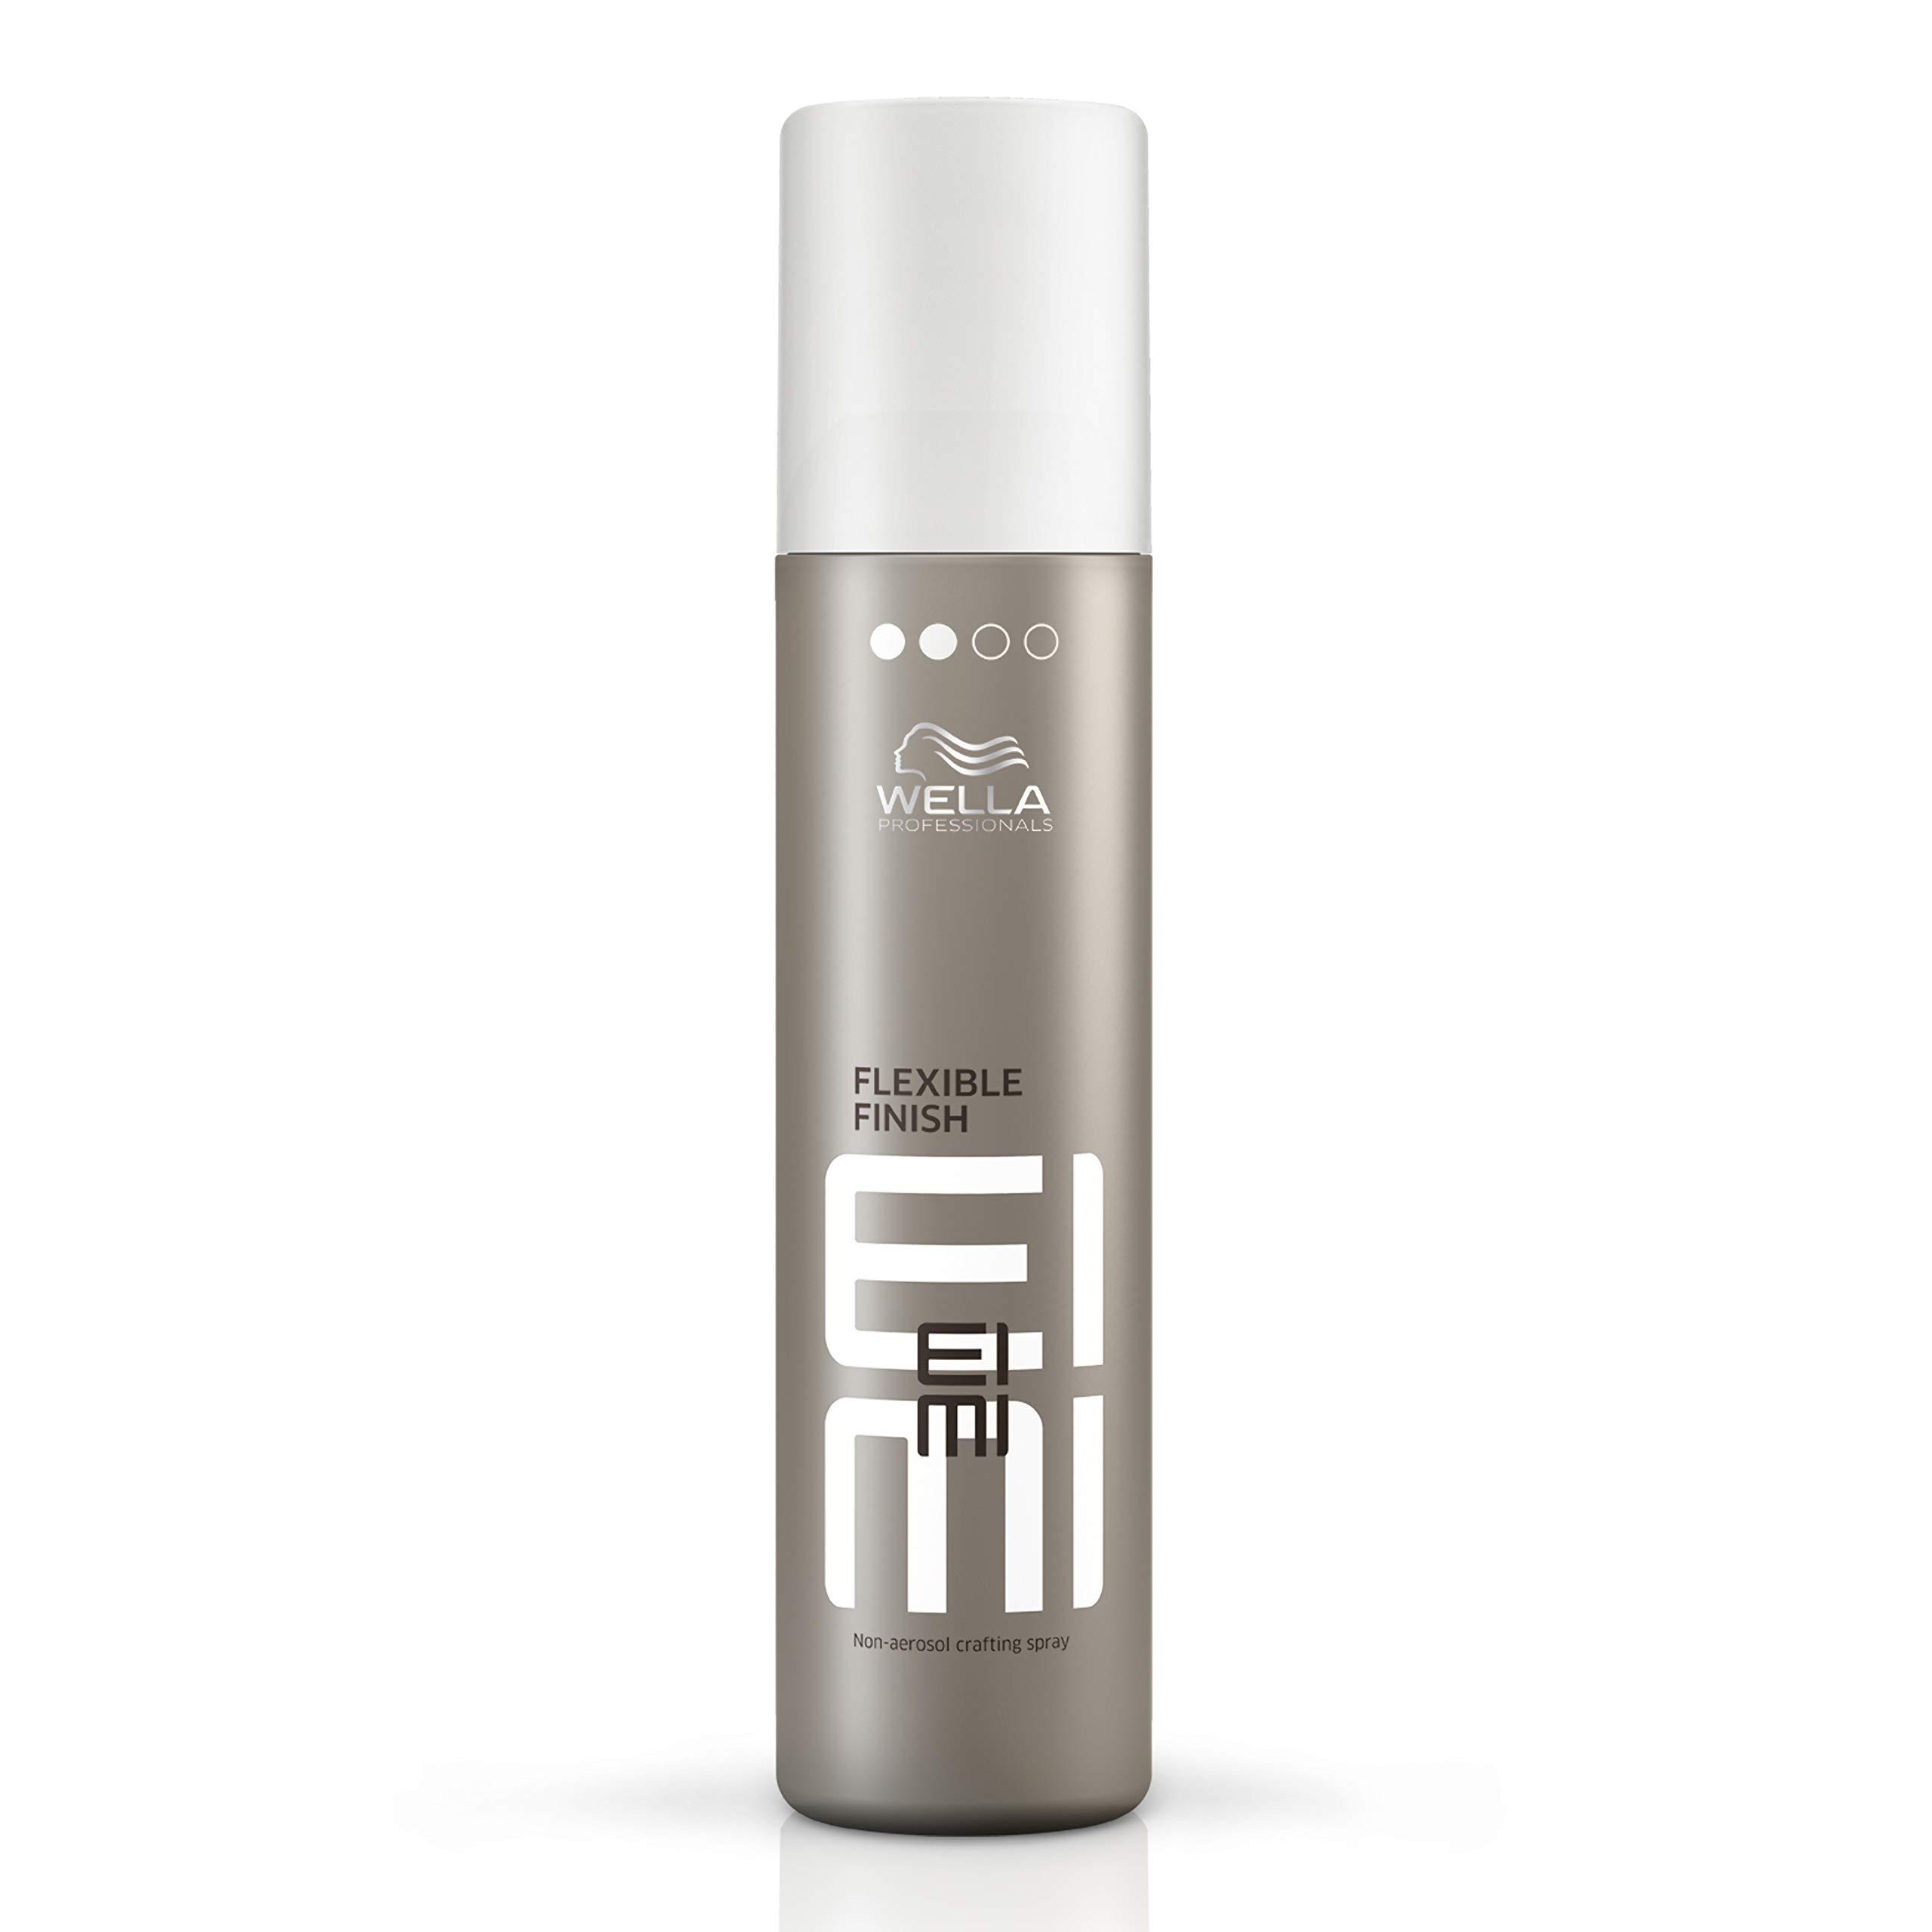 Wella Eimi Flexible Finish Laca – 250 ml